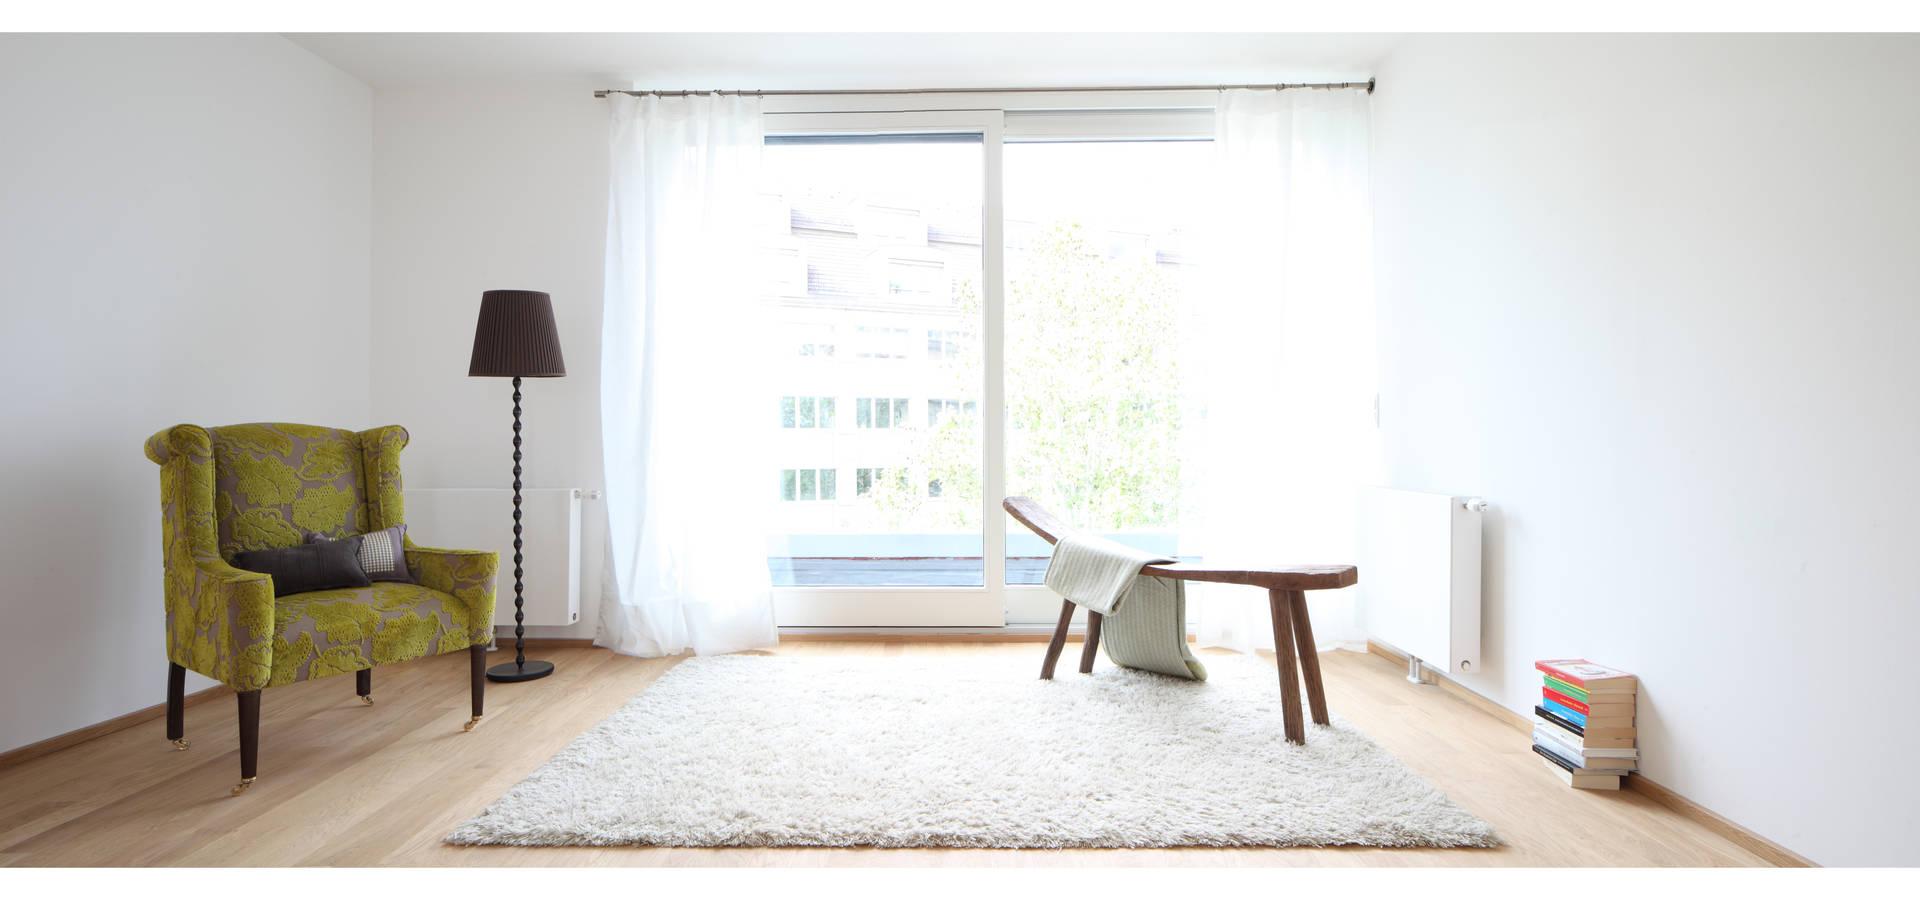 jank ybbsitz gartenm bel kollektion ideen garten design. Black Bedroom Furniture Sets. Home Design Ideas